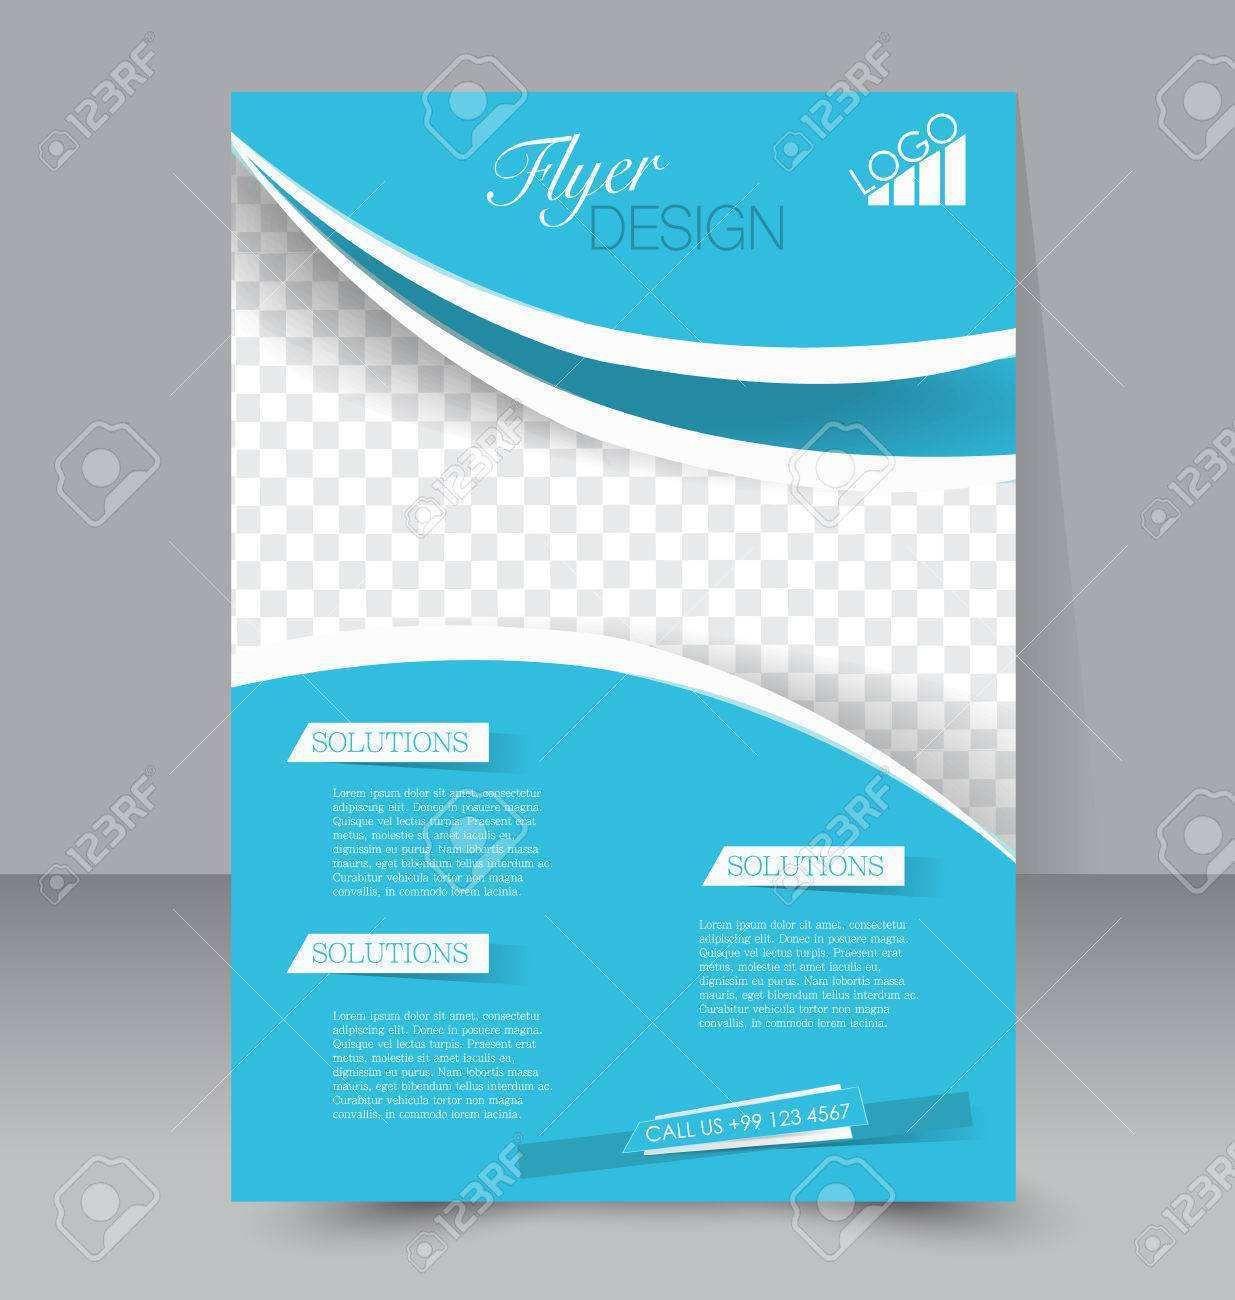 001 Sensational Free Editable Flyer Template High Def  Busines FundraisingFull